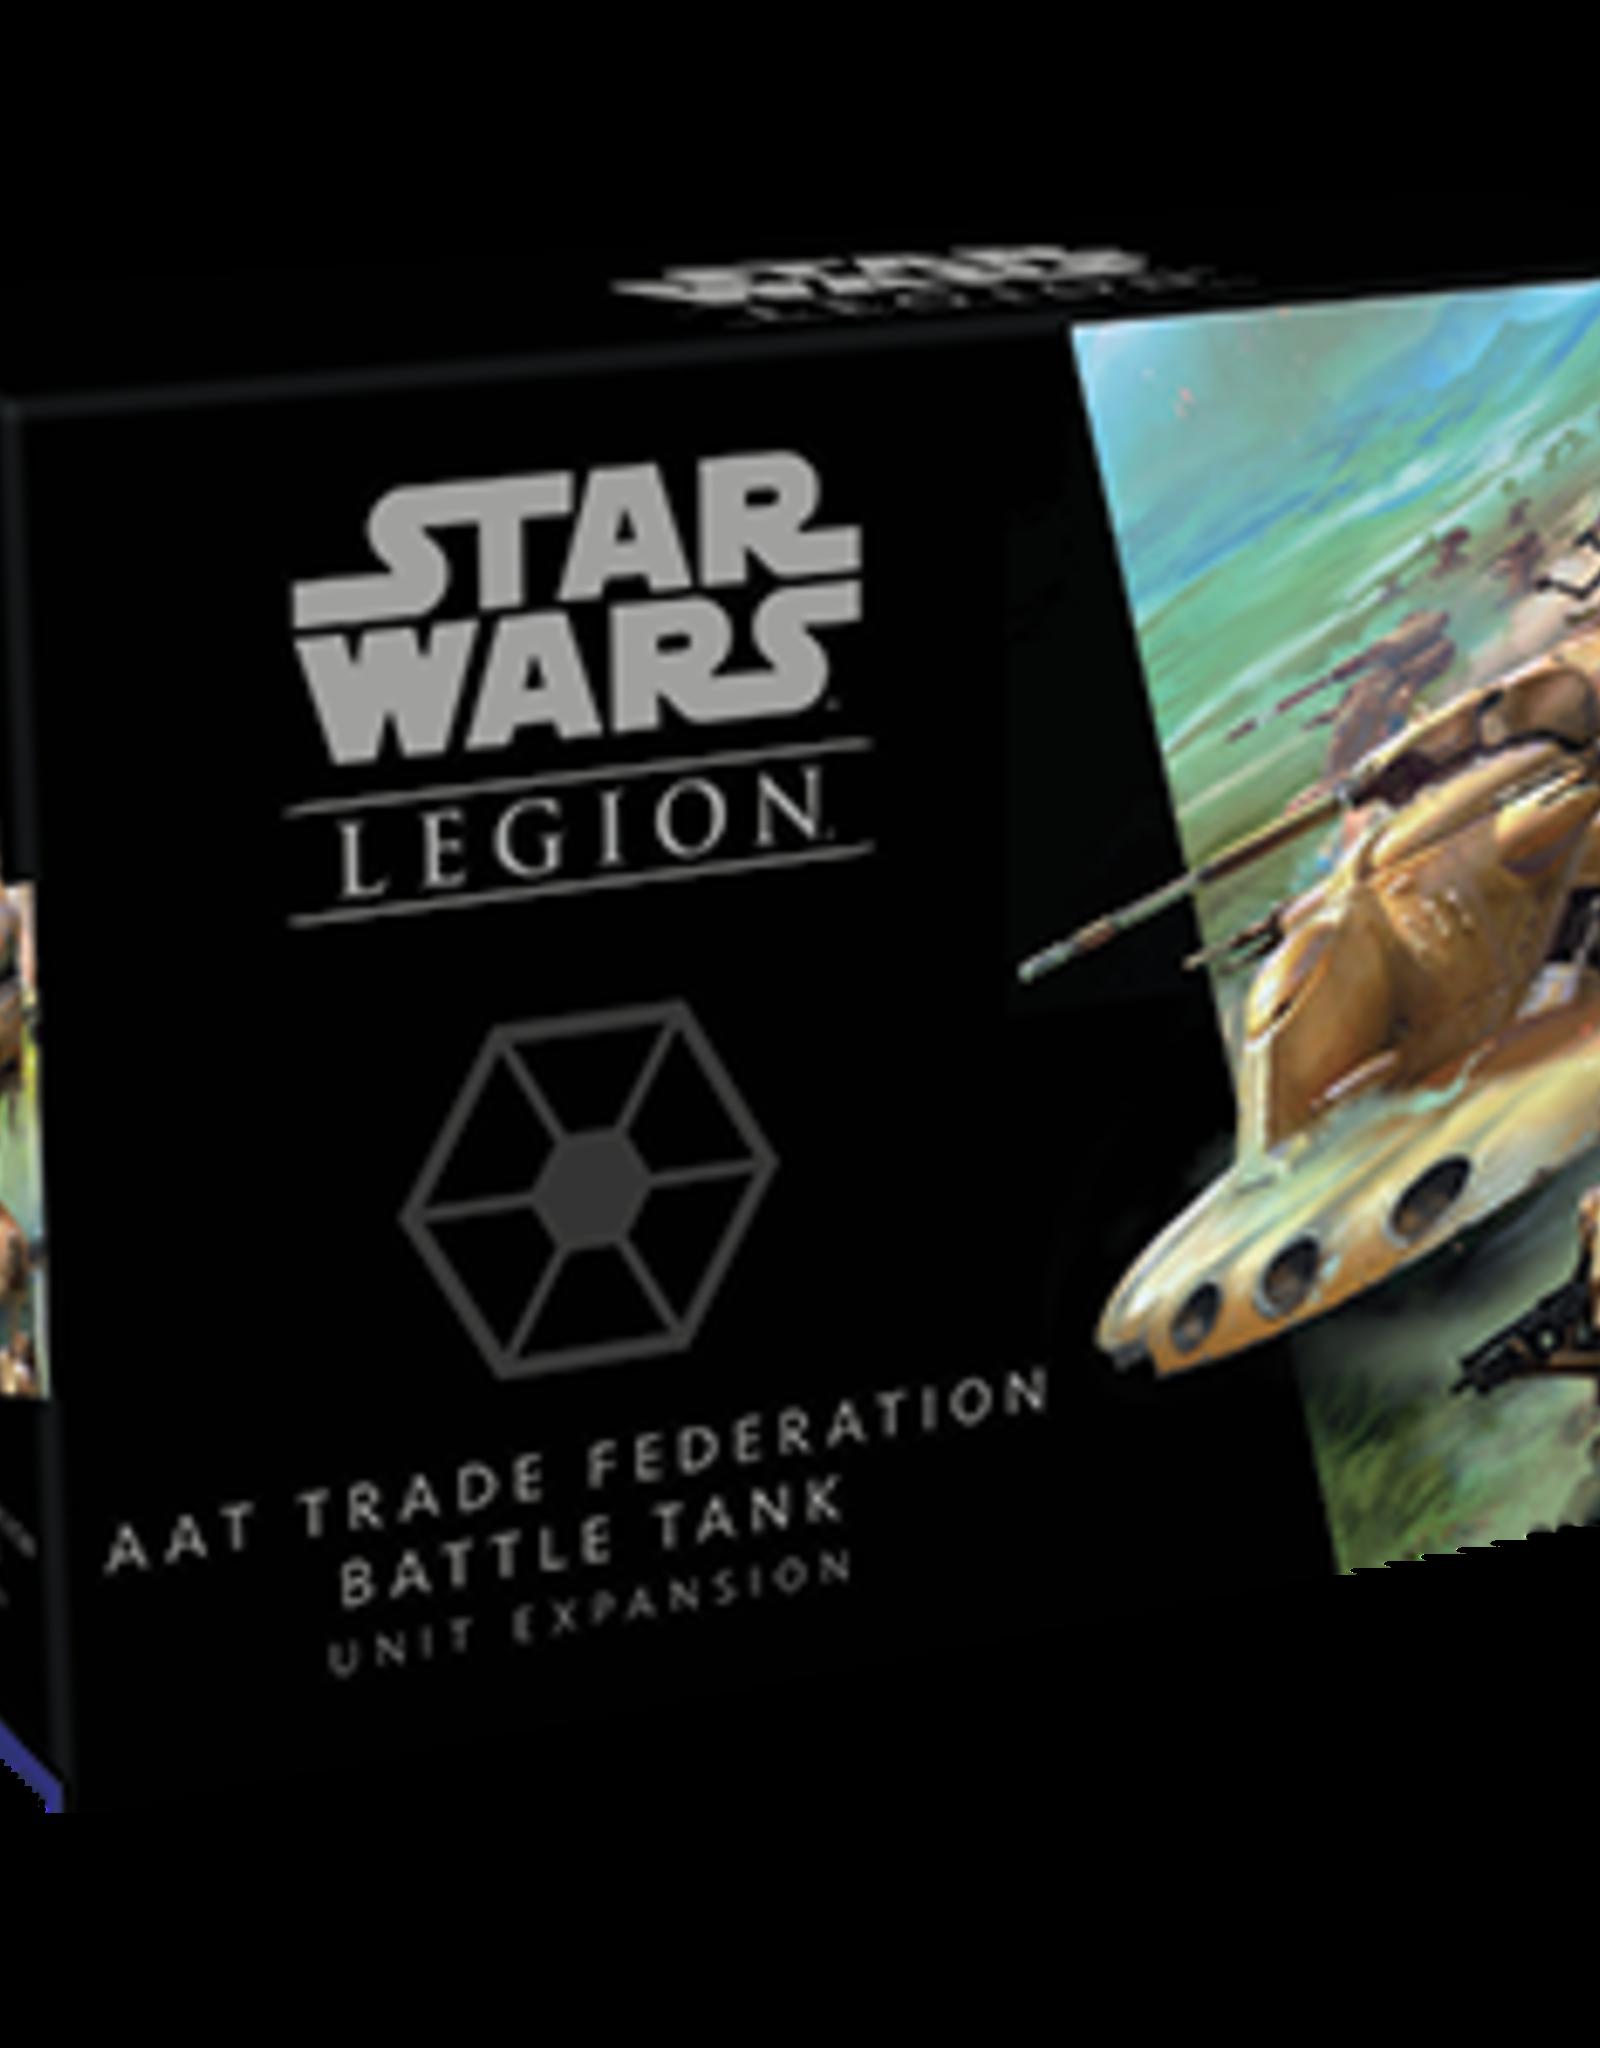 Star Wars Legion AAT Trade Feration Battle Tank